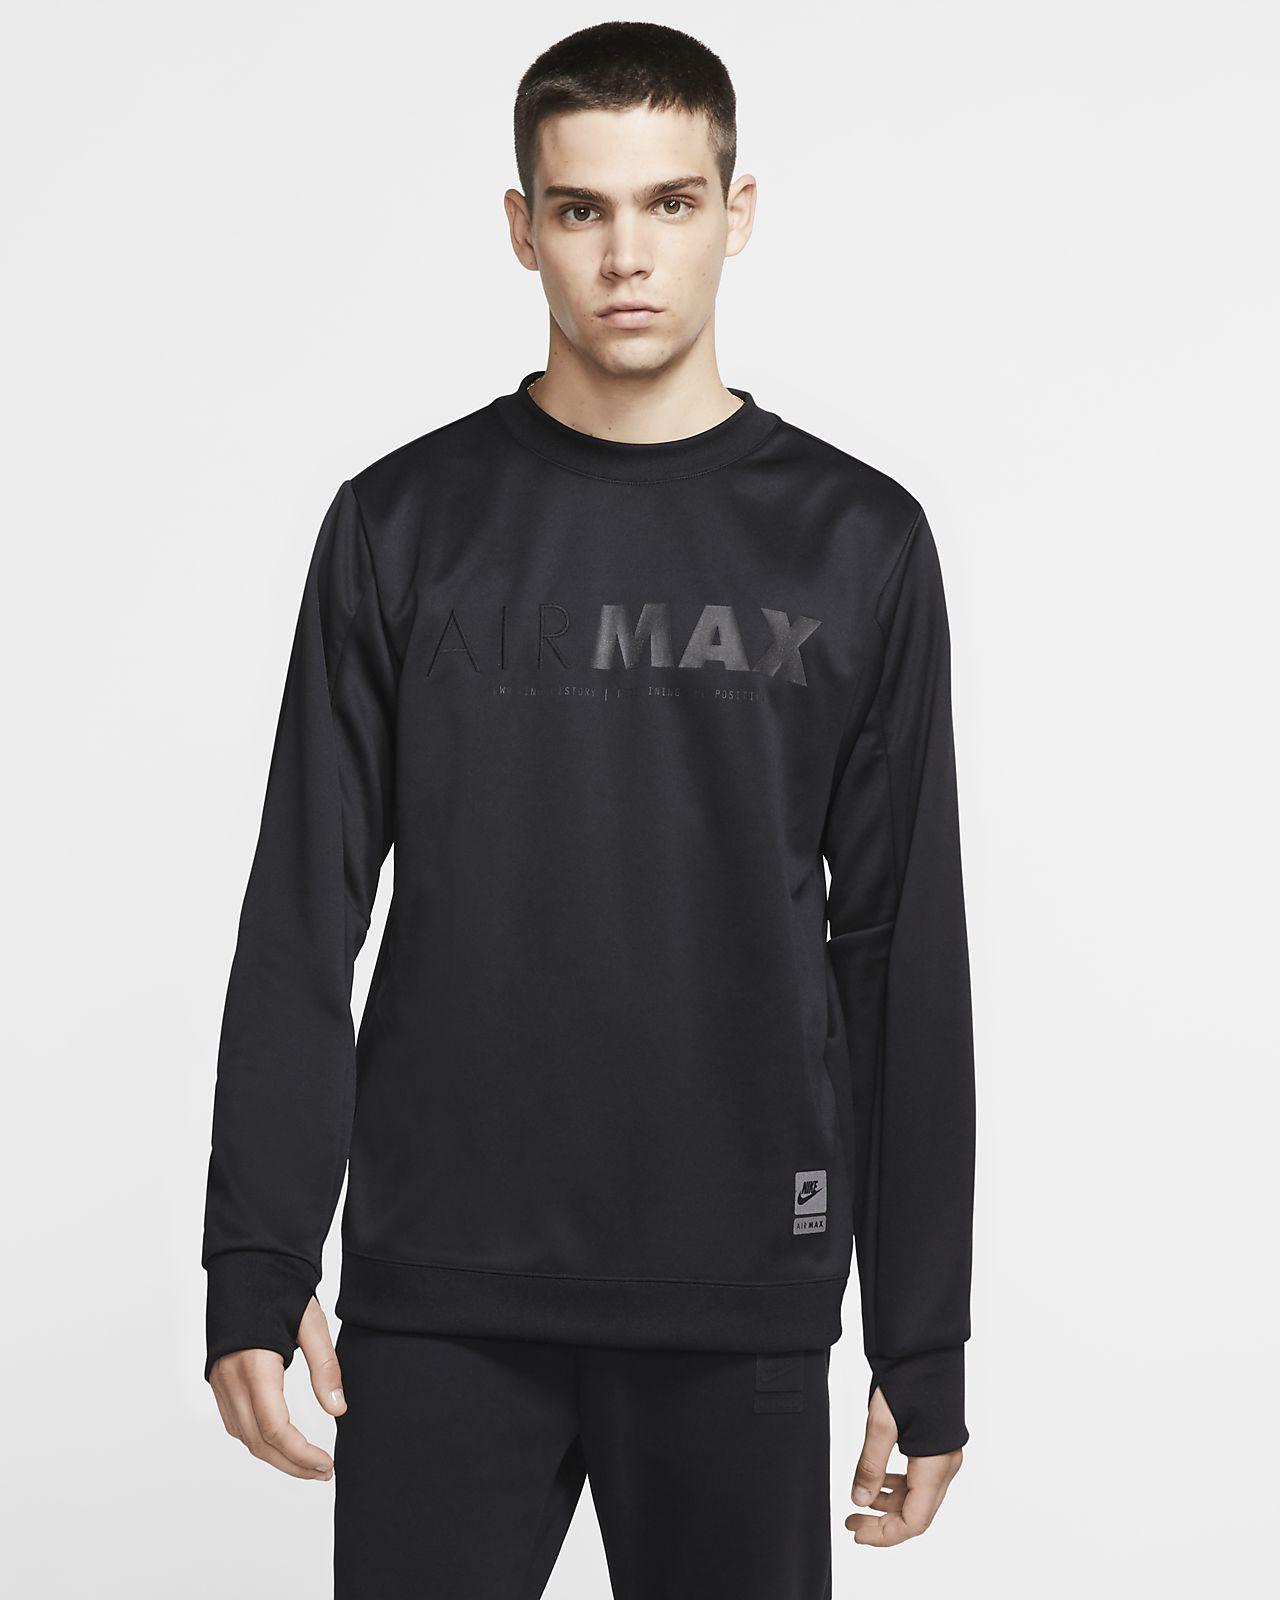 Nike Sportswear Air Max Sudadera - Hombre